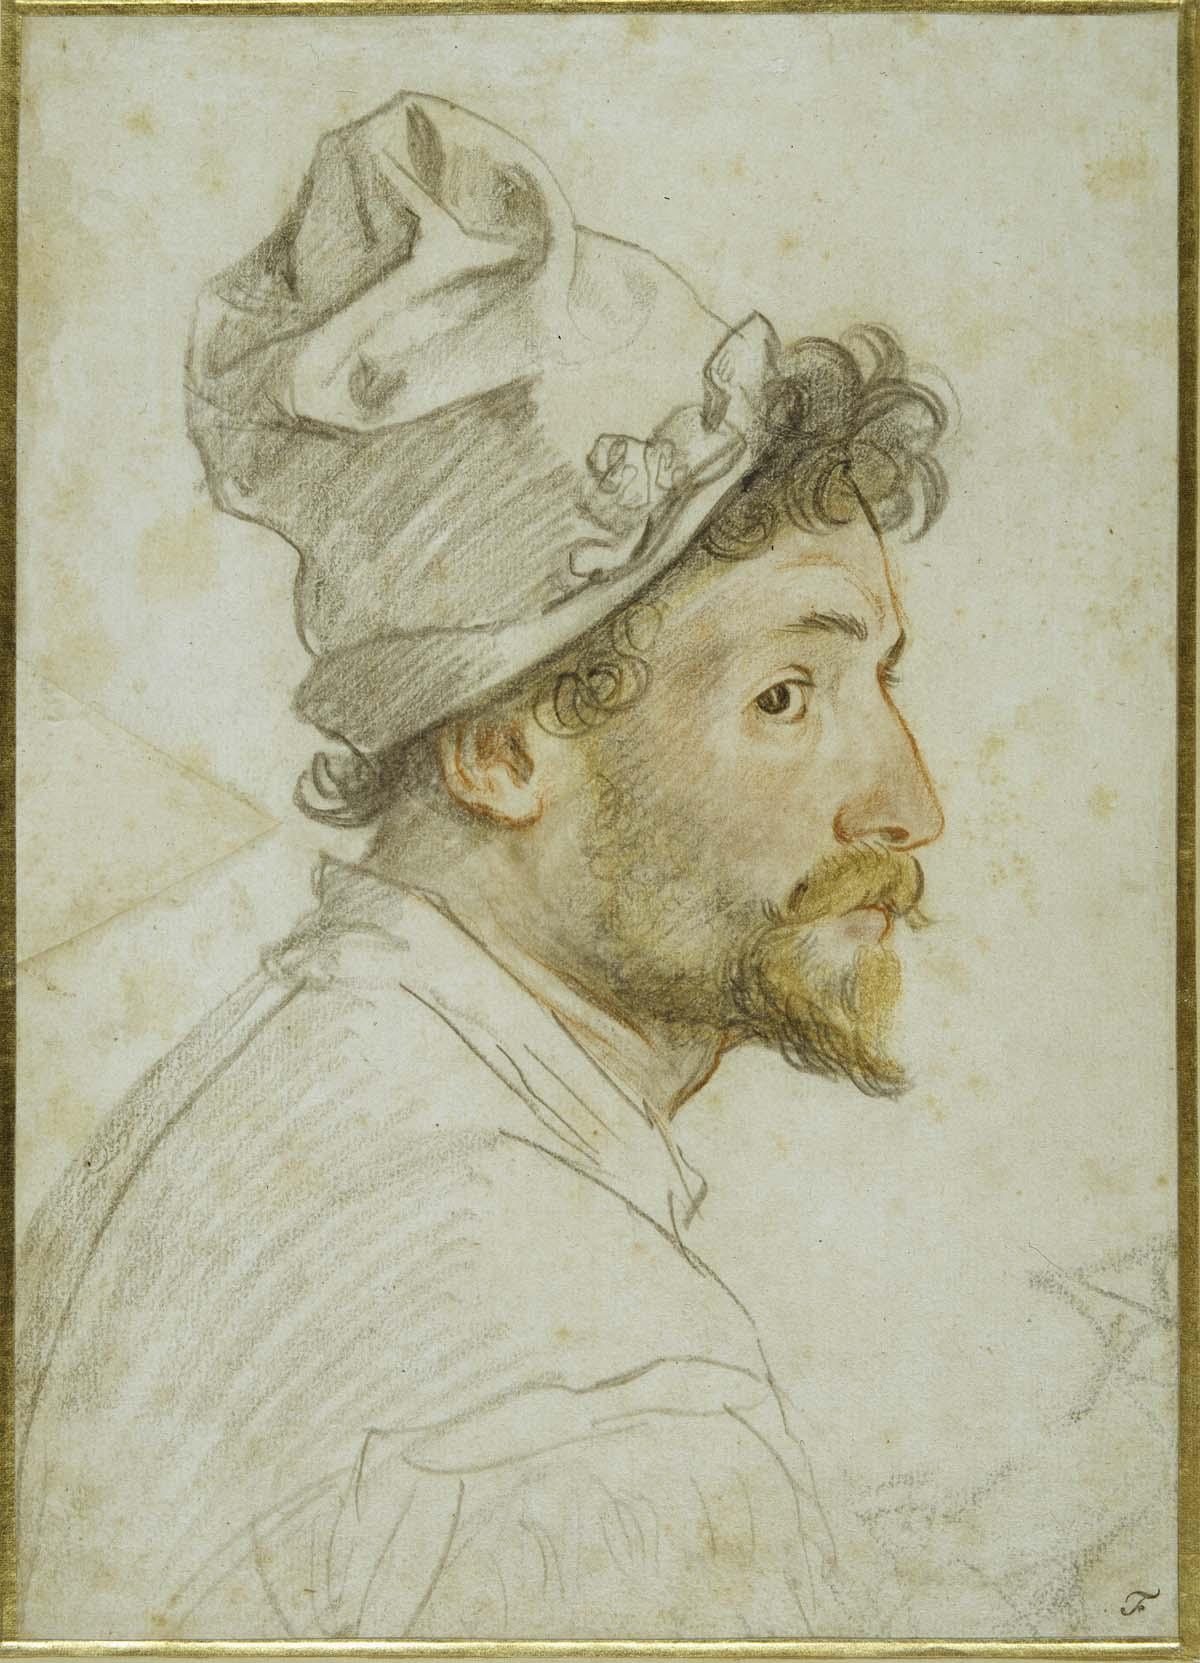 side profile colour pencil portrait of a bearded man with a cap